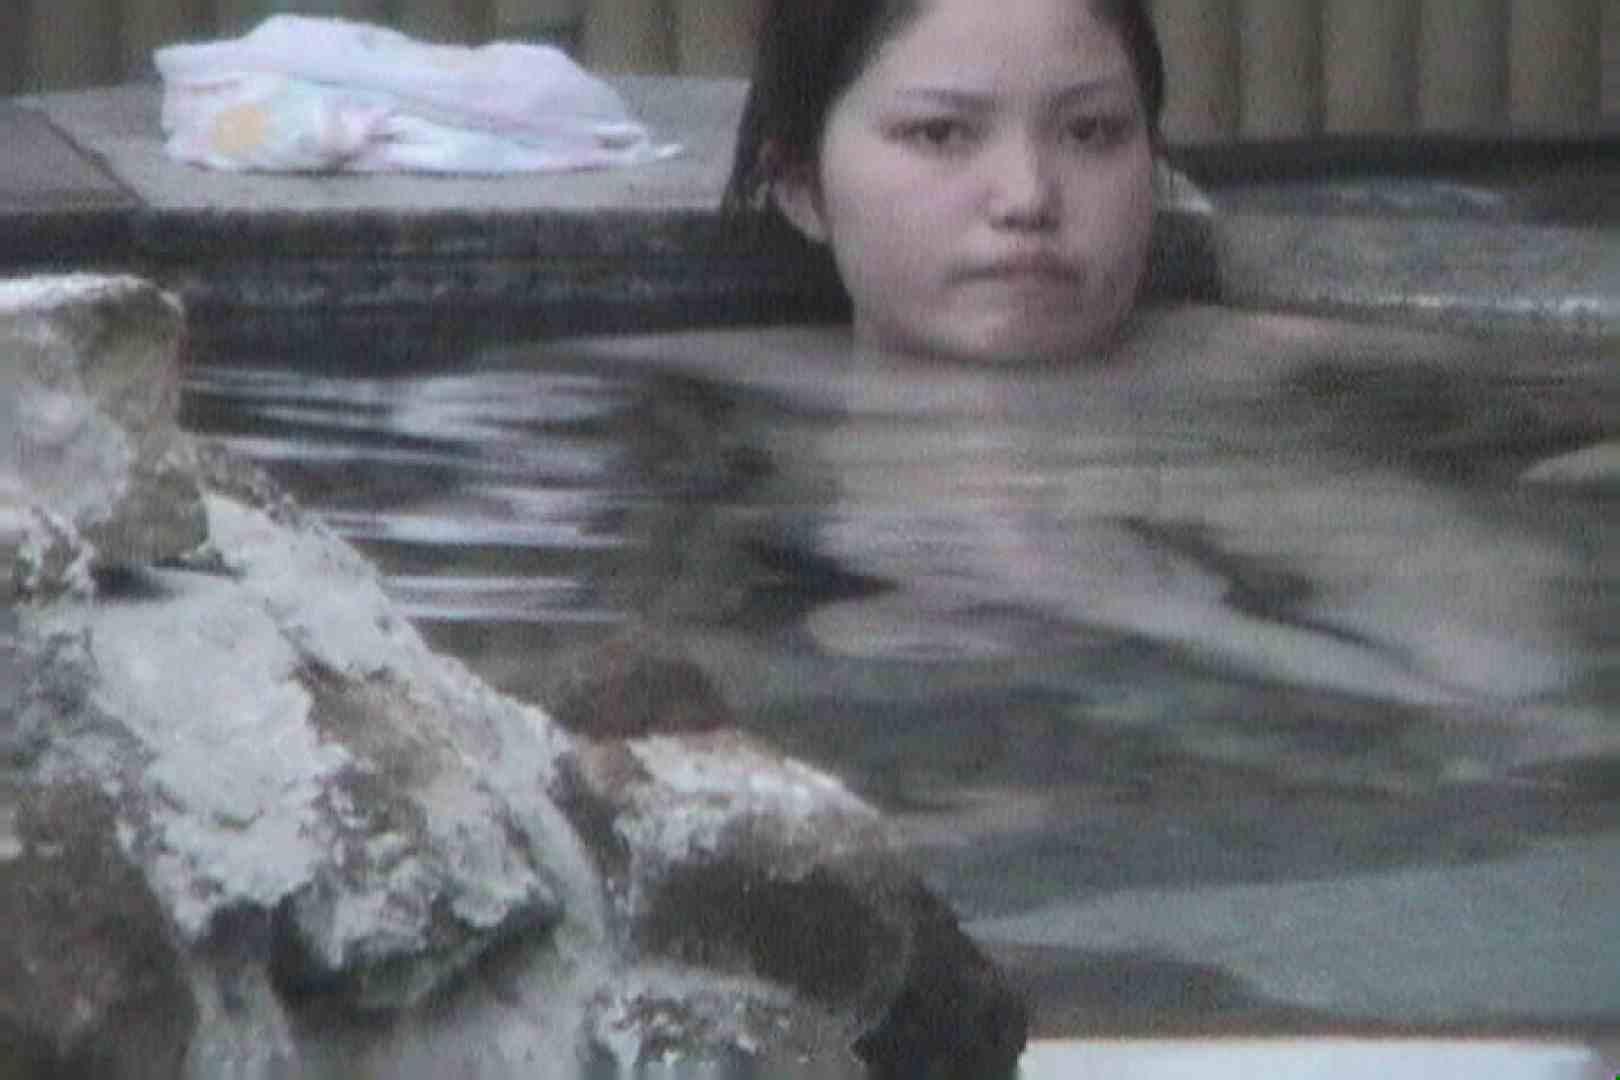 Aquaな露天風呂Vol.602 0 | HなOL  110pic 105